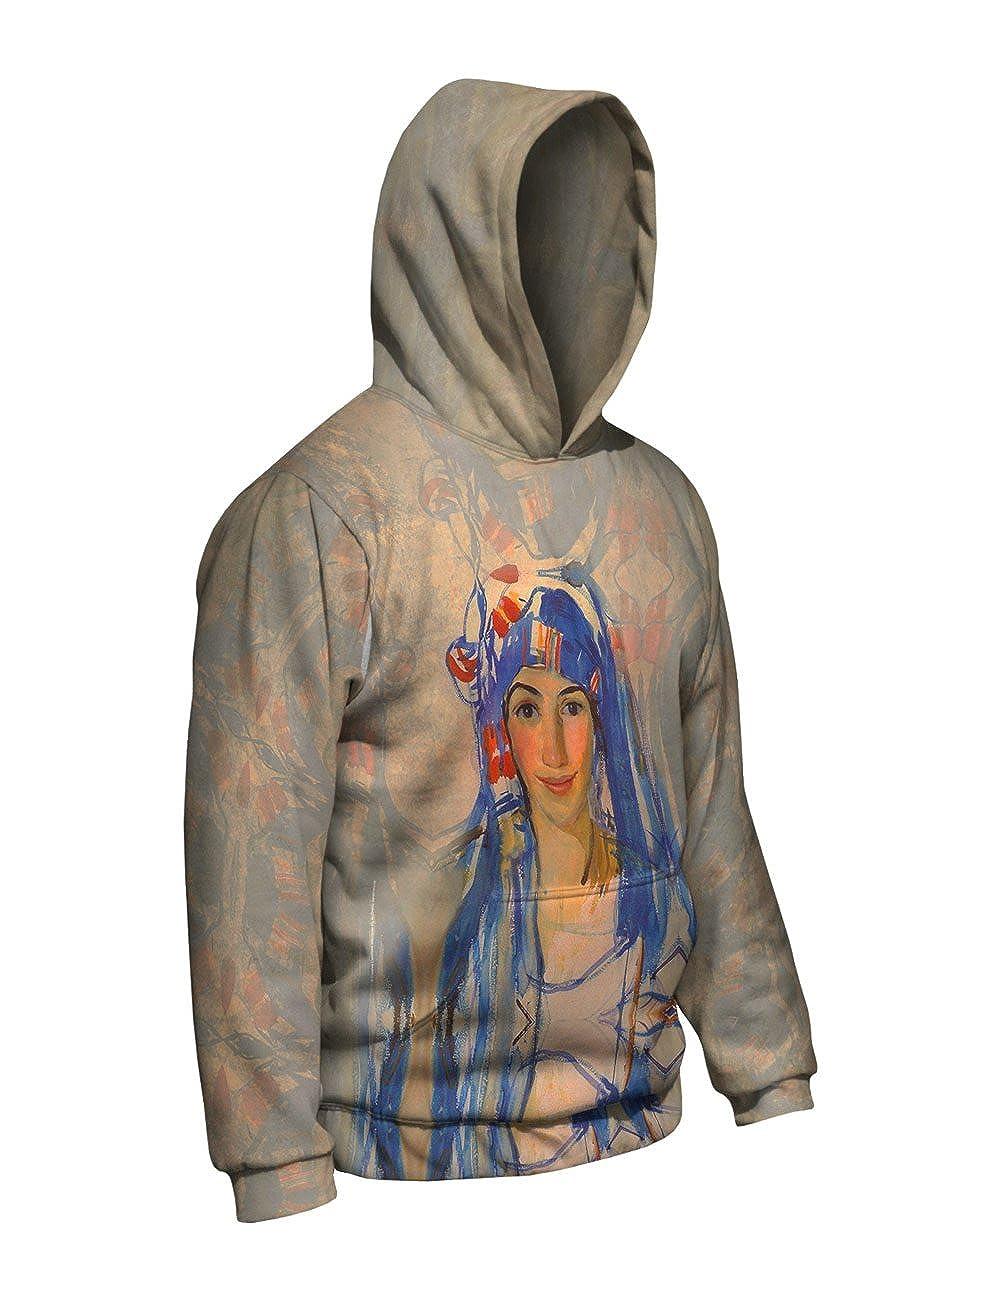 Self Portr Allover Print Mens Hoodie 2393 Yizzam- Zinaida Serebriakova